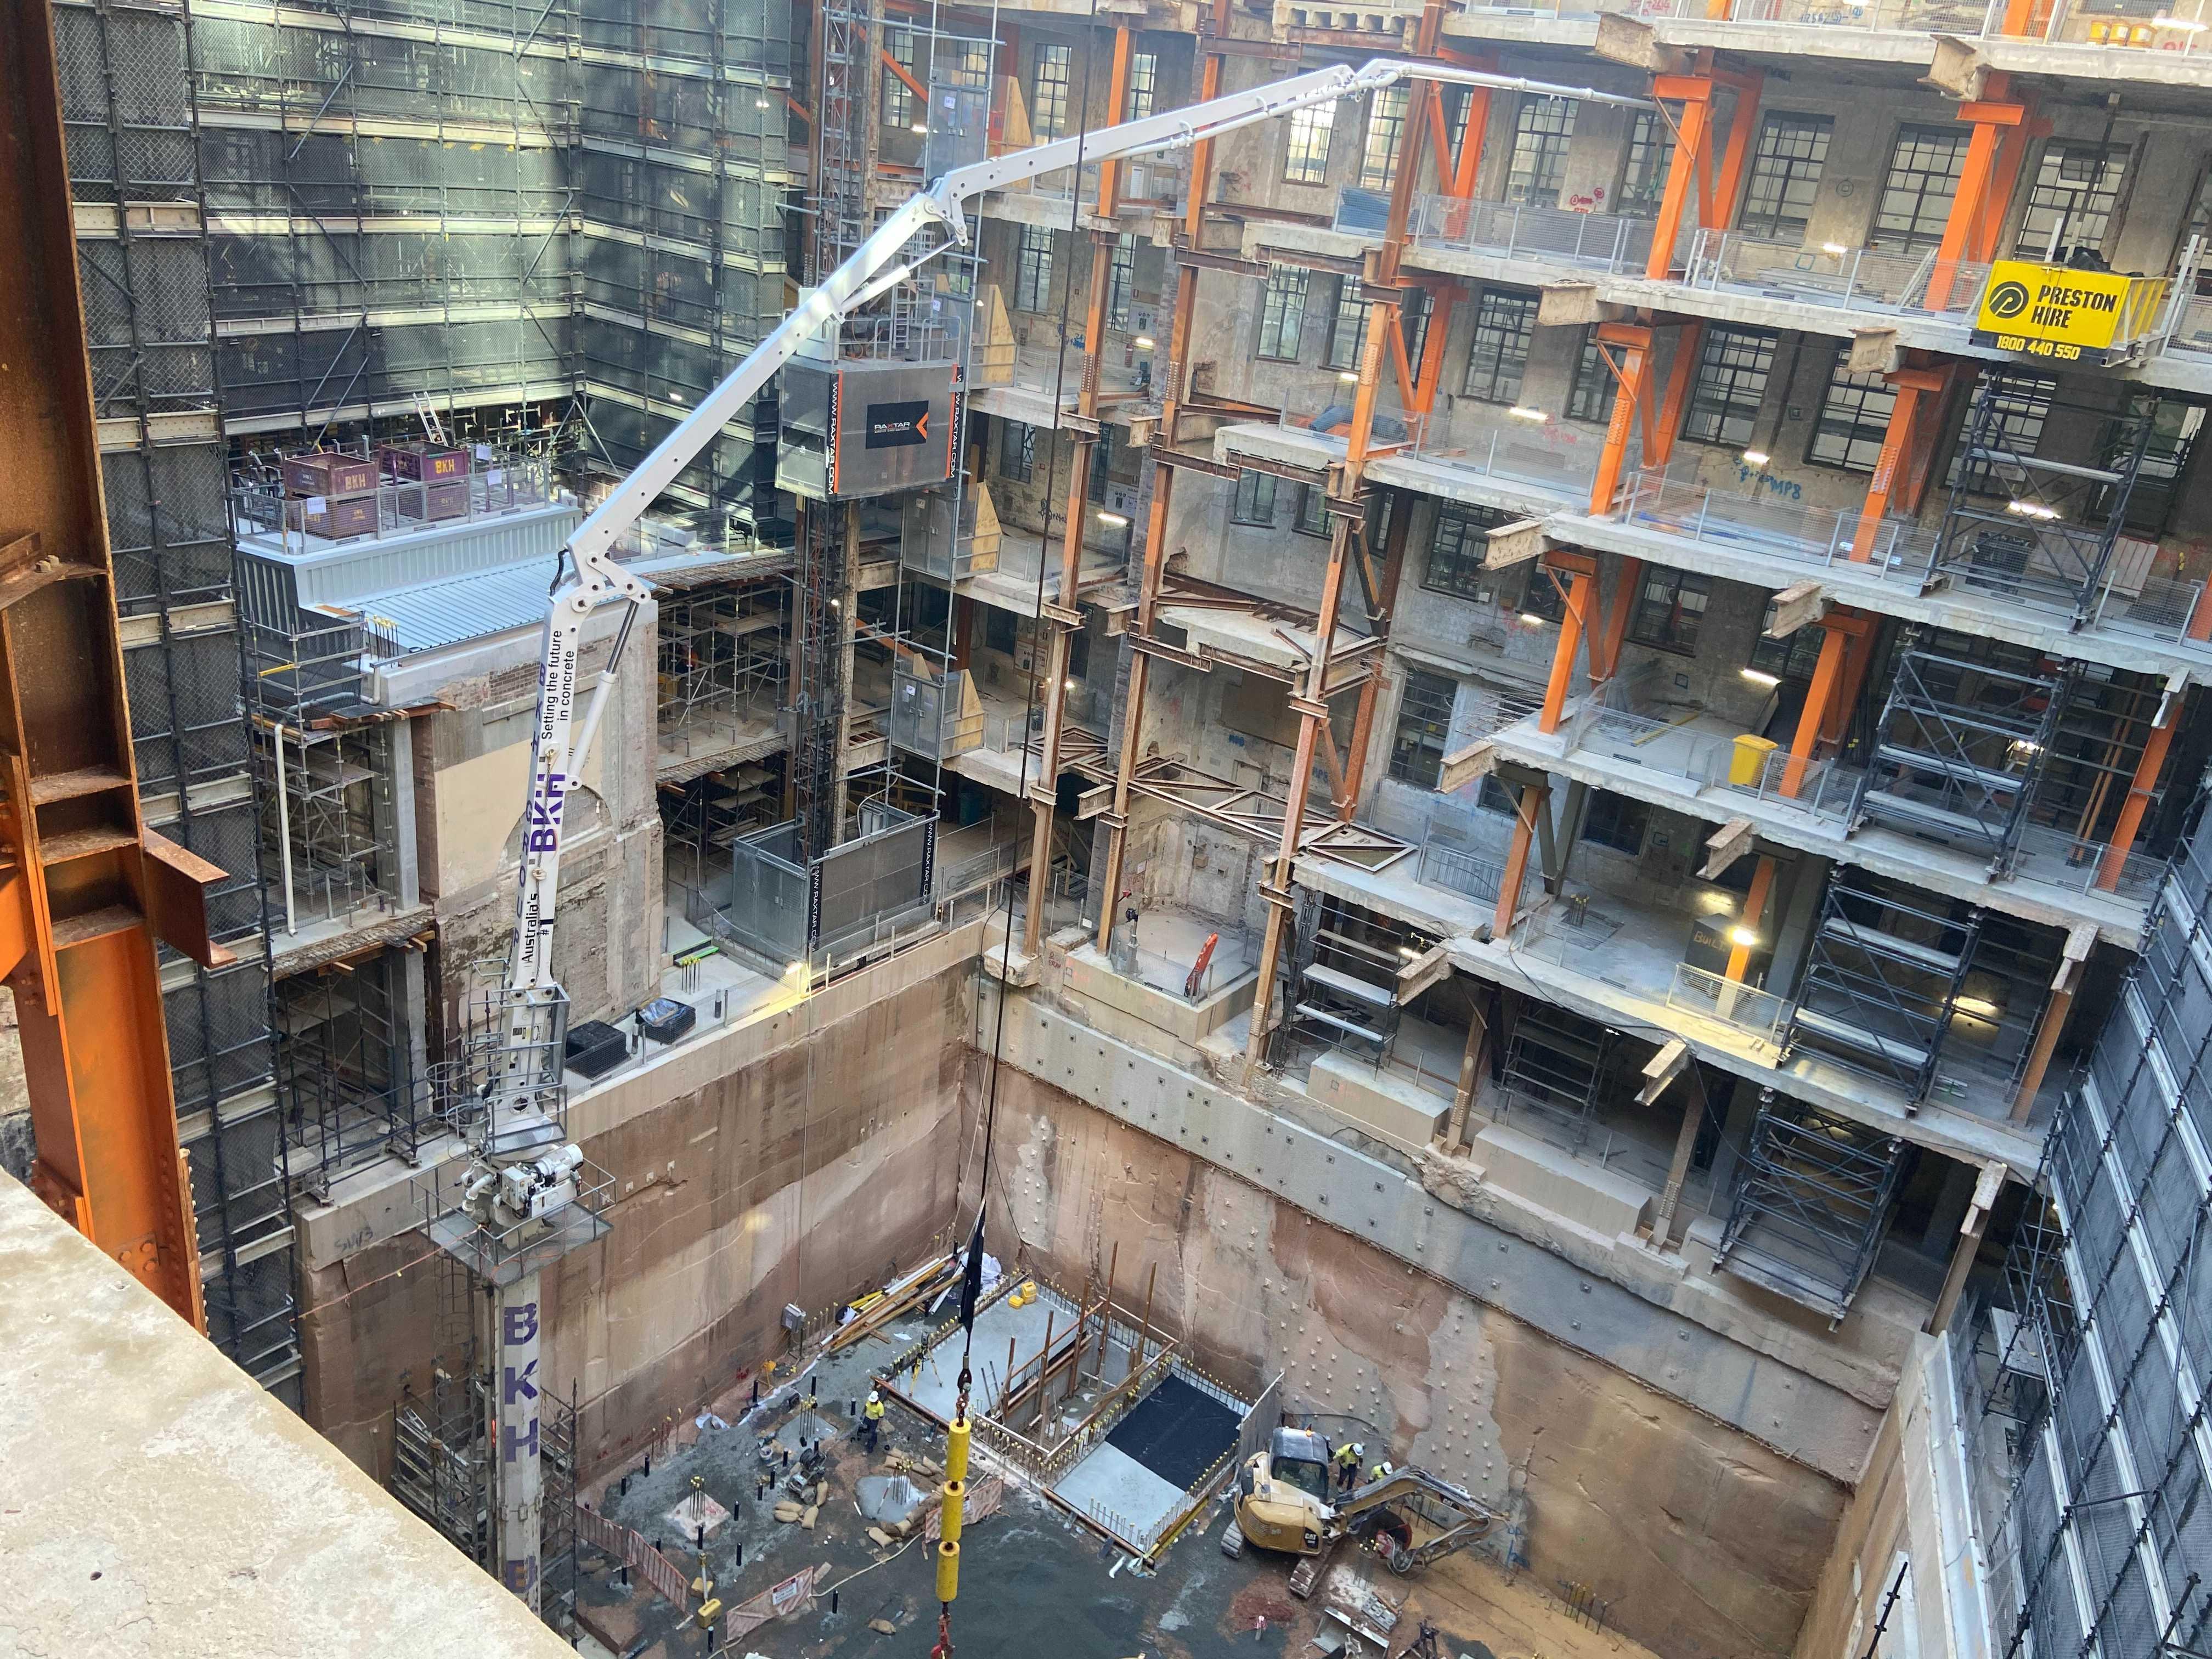 Hire 36 metre Concrete Placing Boom Pumps - Tower Booms